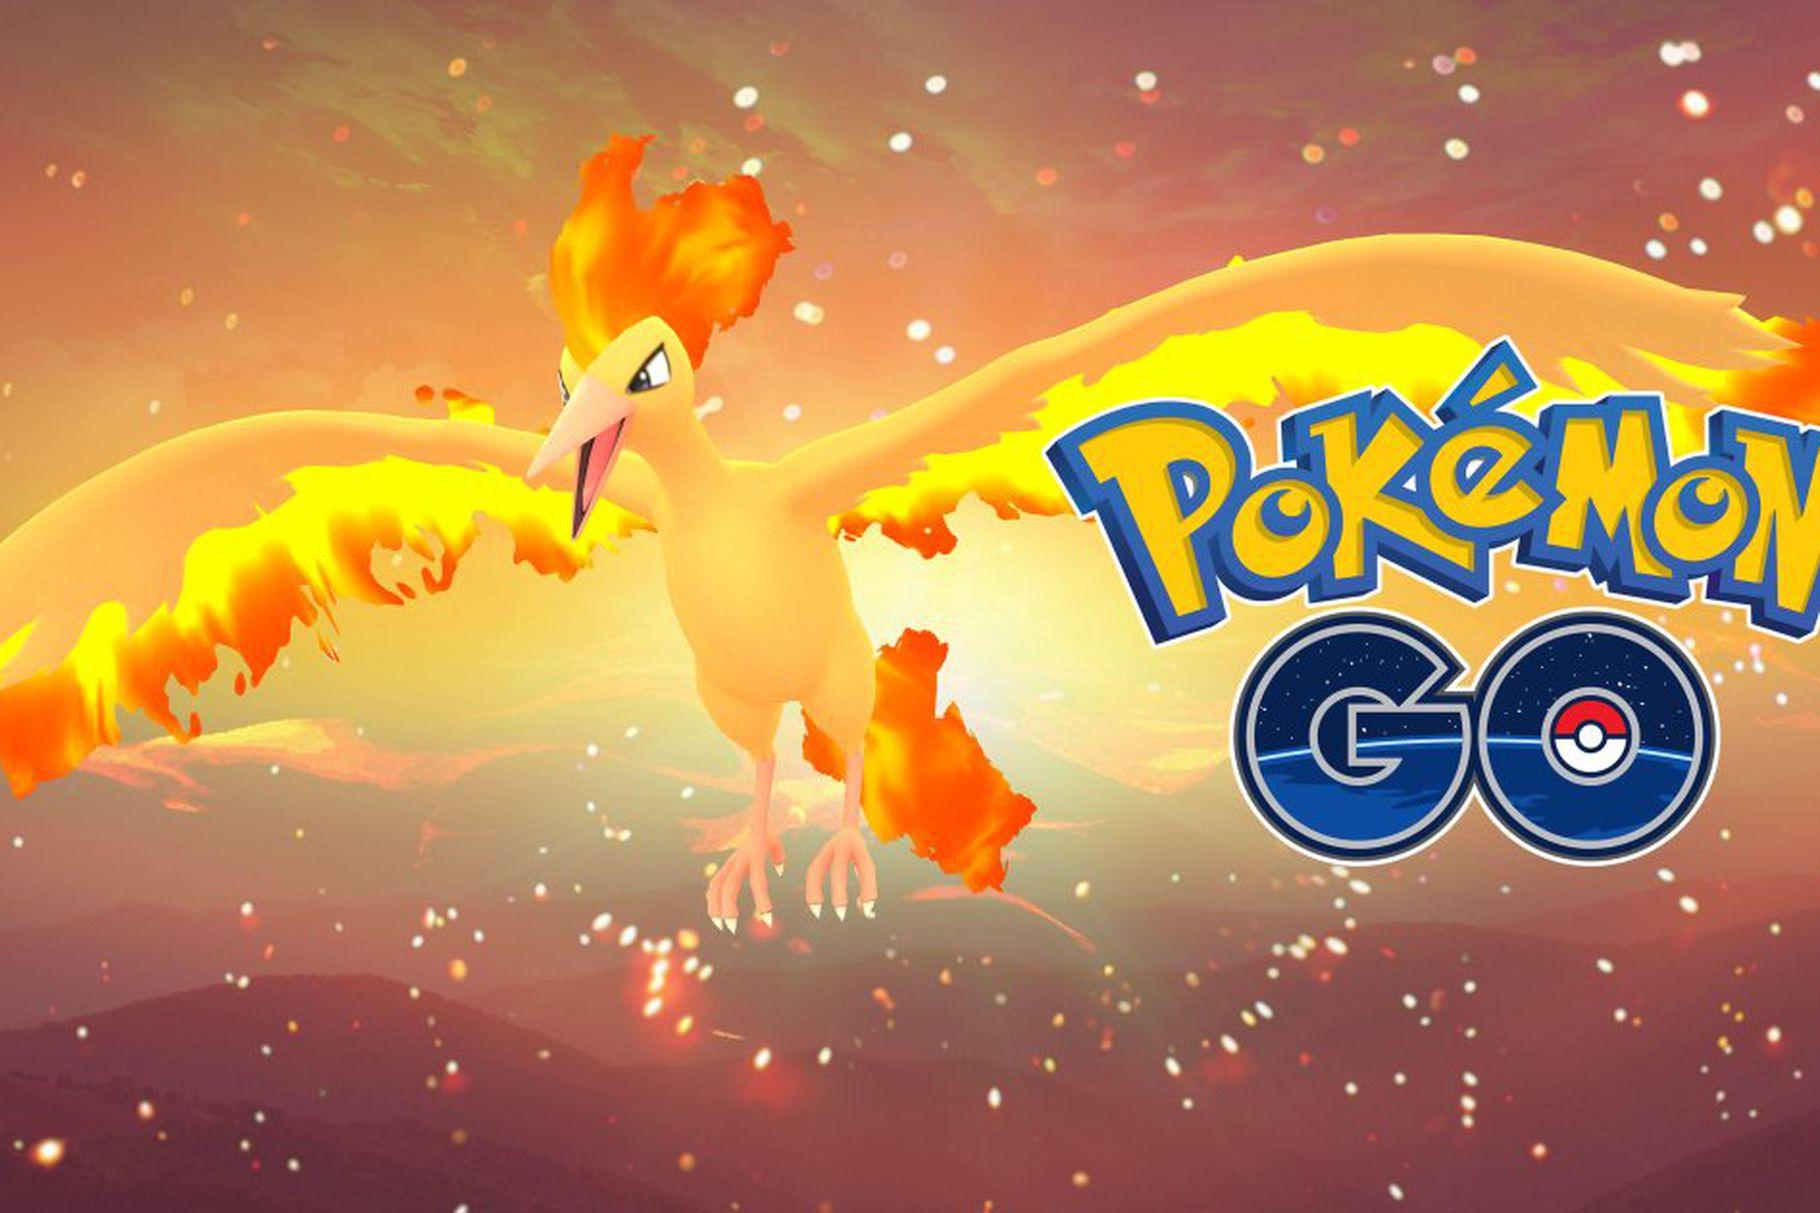 Pokémon Go: Moltres